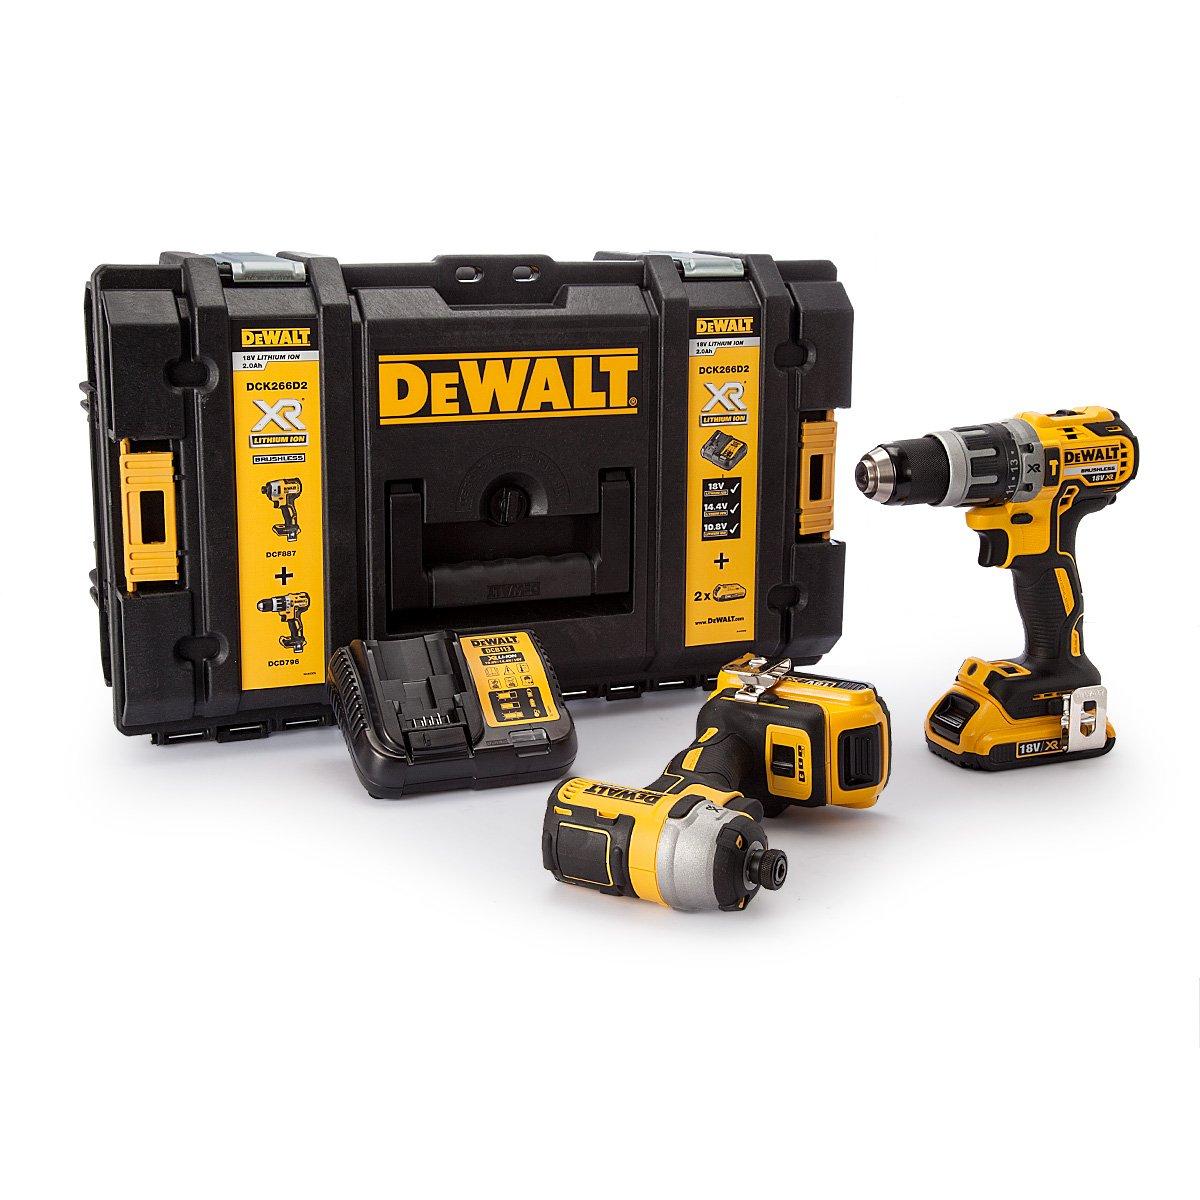 Dewalt DCK266D2-GB DCK266D2 Combi Drill and Impact Driver XR 18V Brushless Kit, 18 V